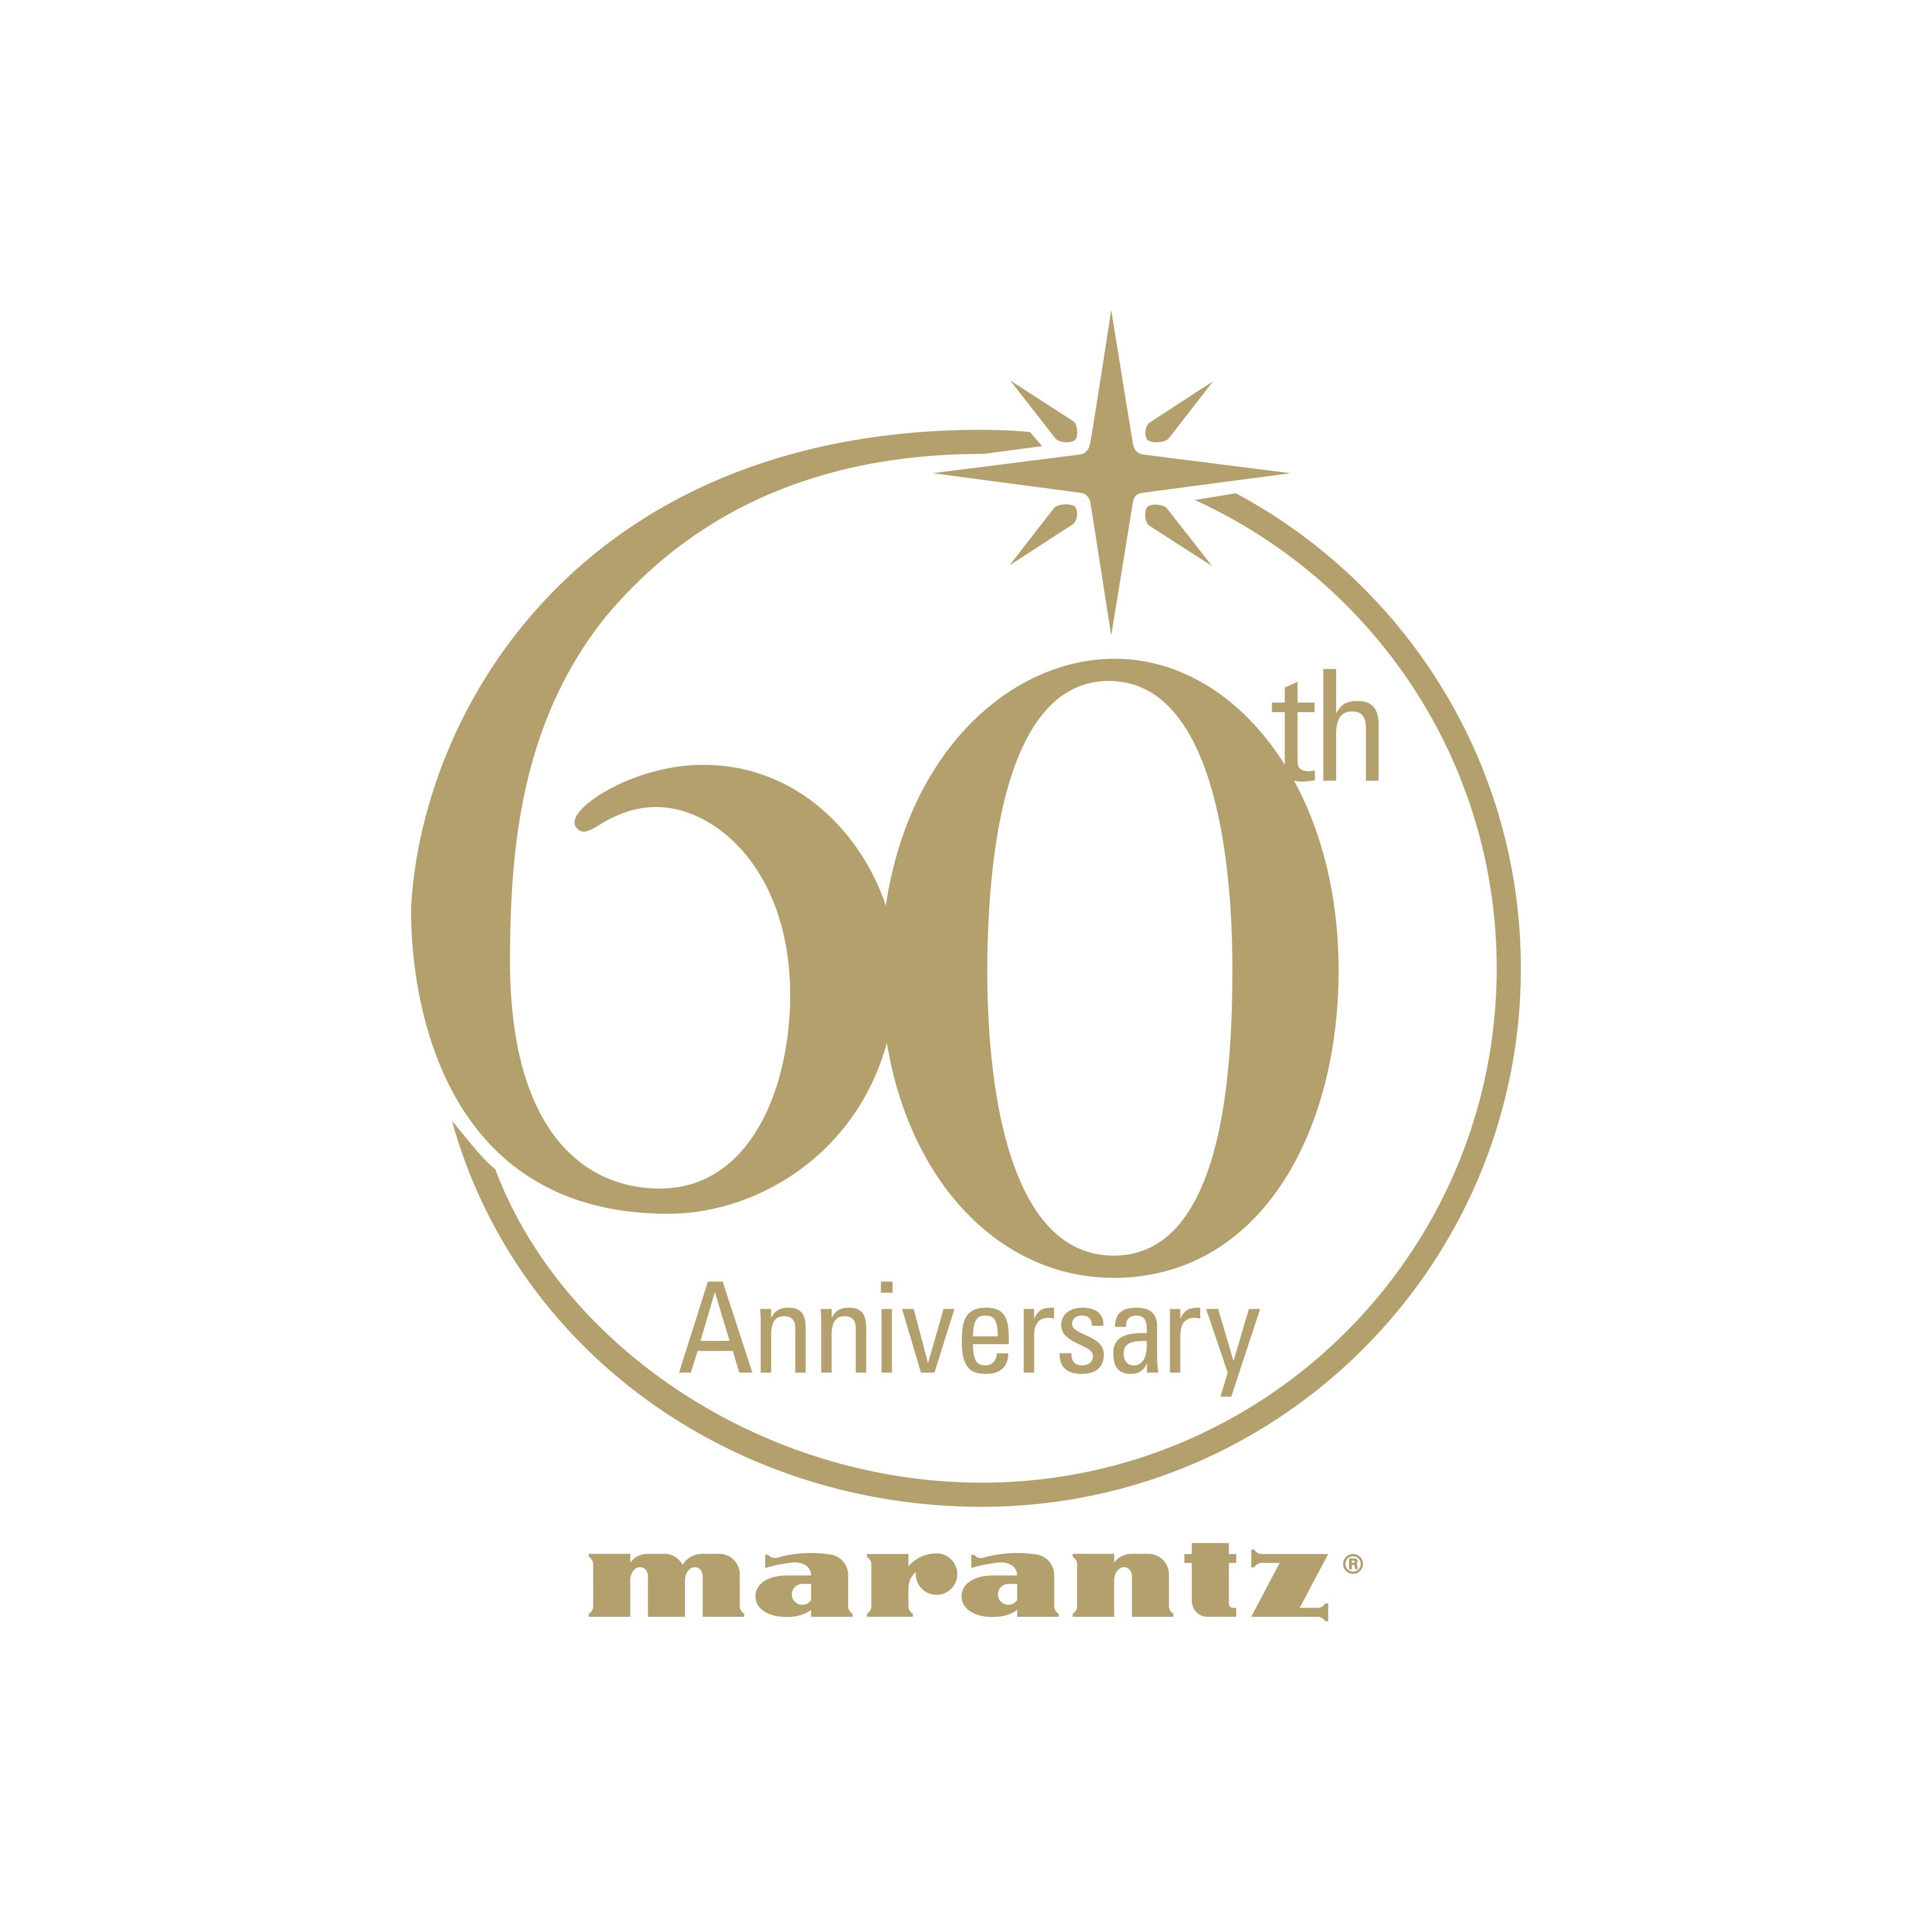 Marantz Consolette60th Docx